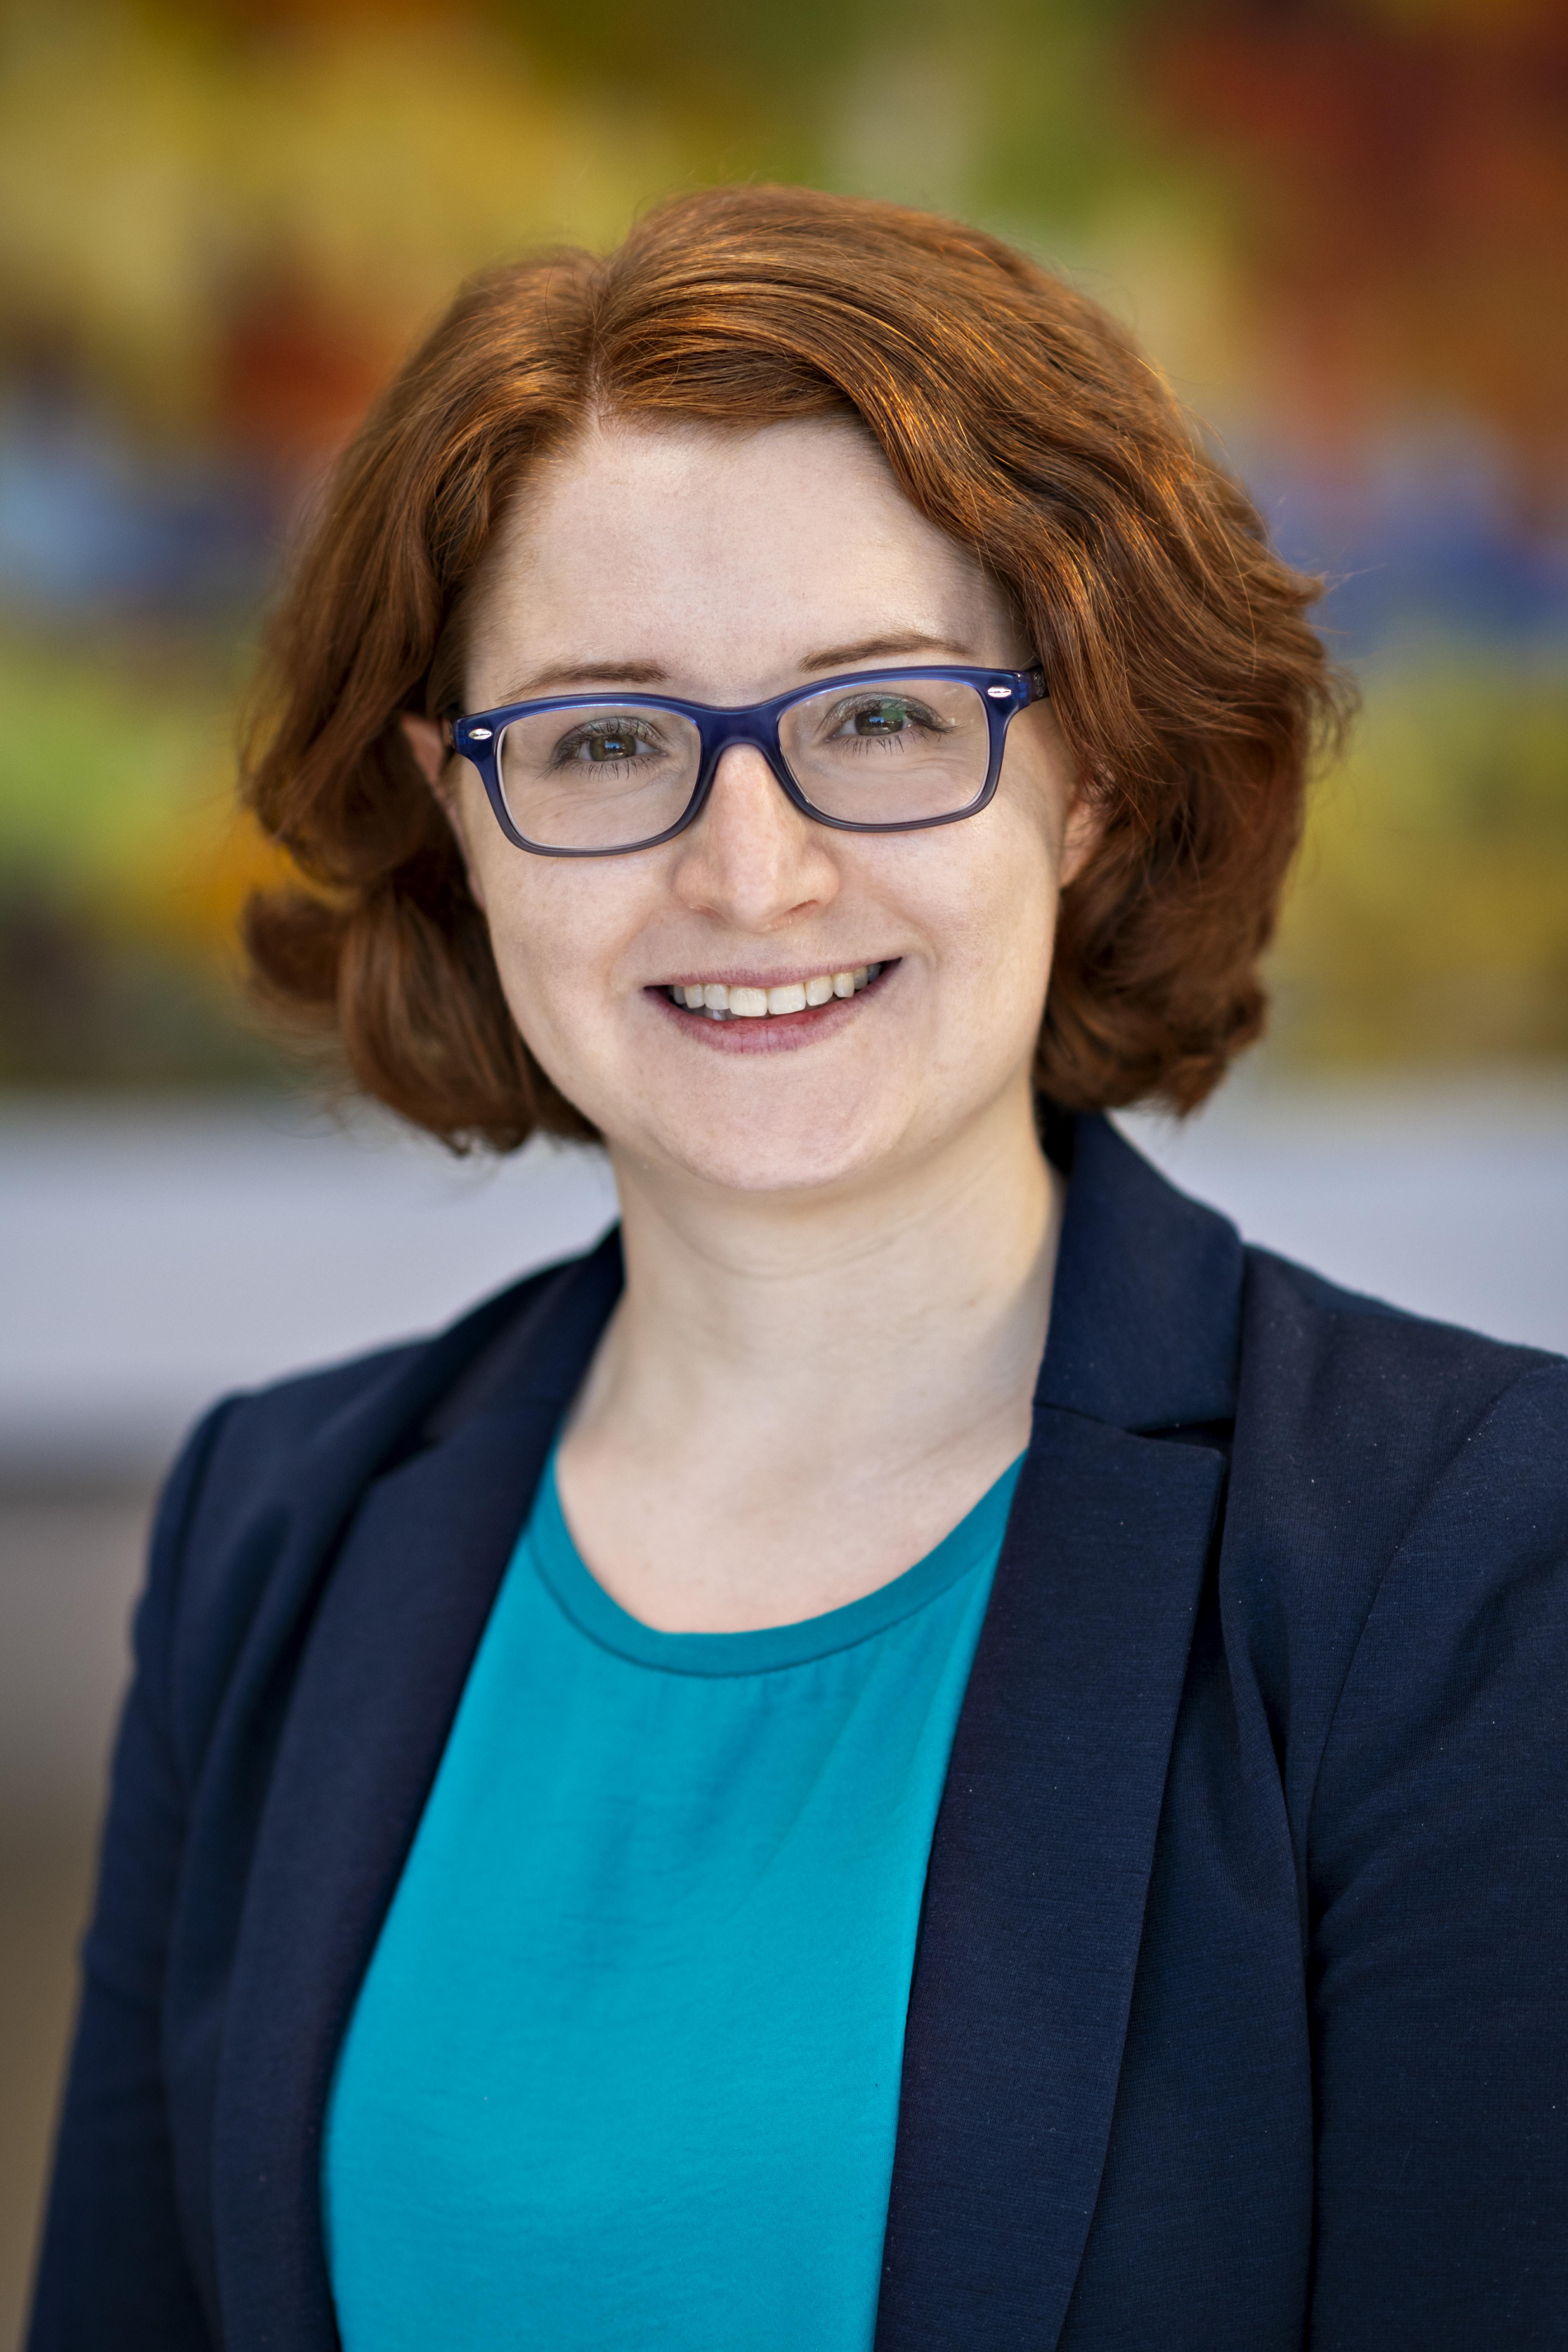 Milena Schönke, PhD